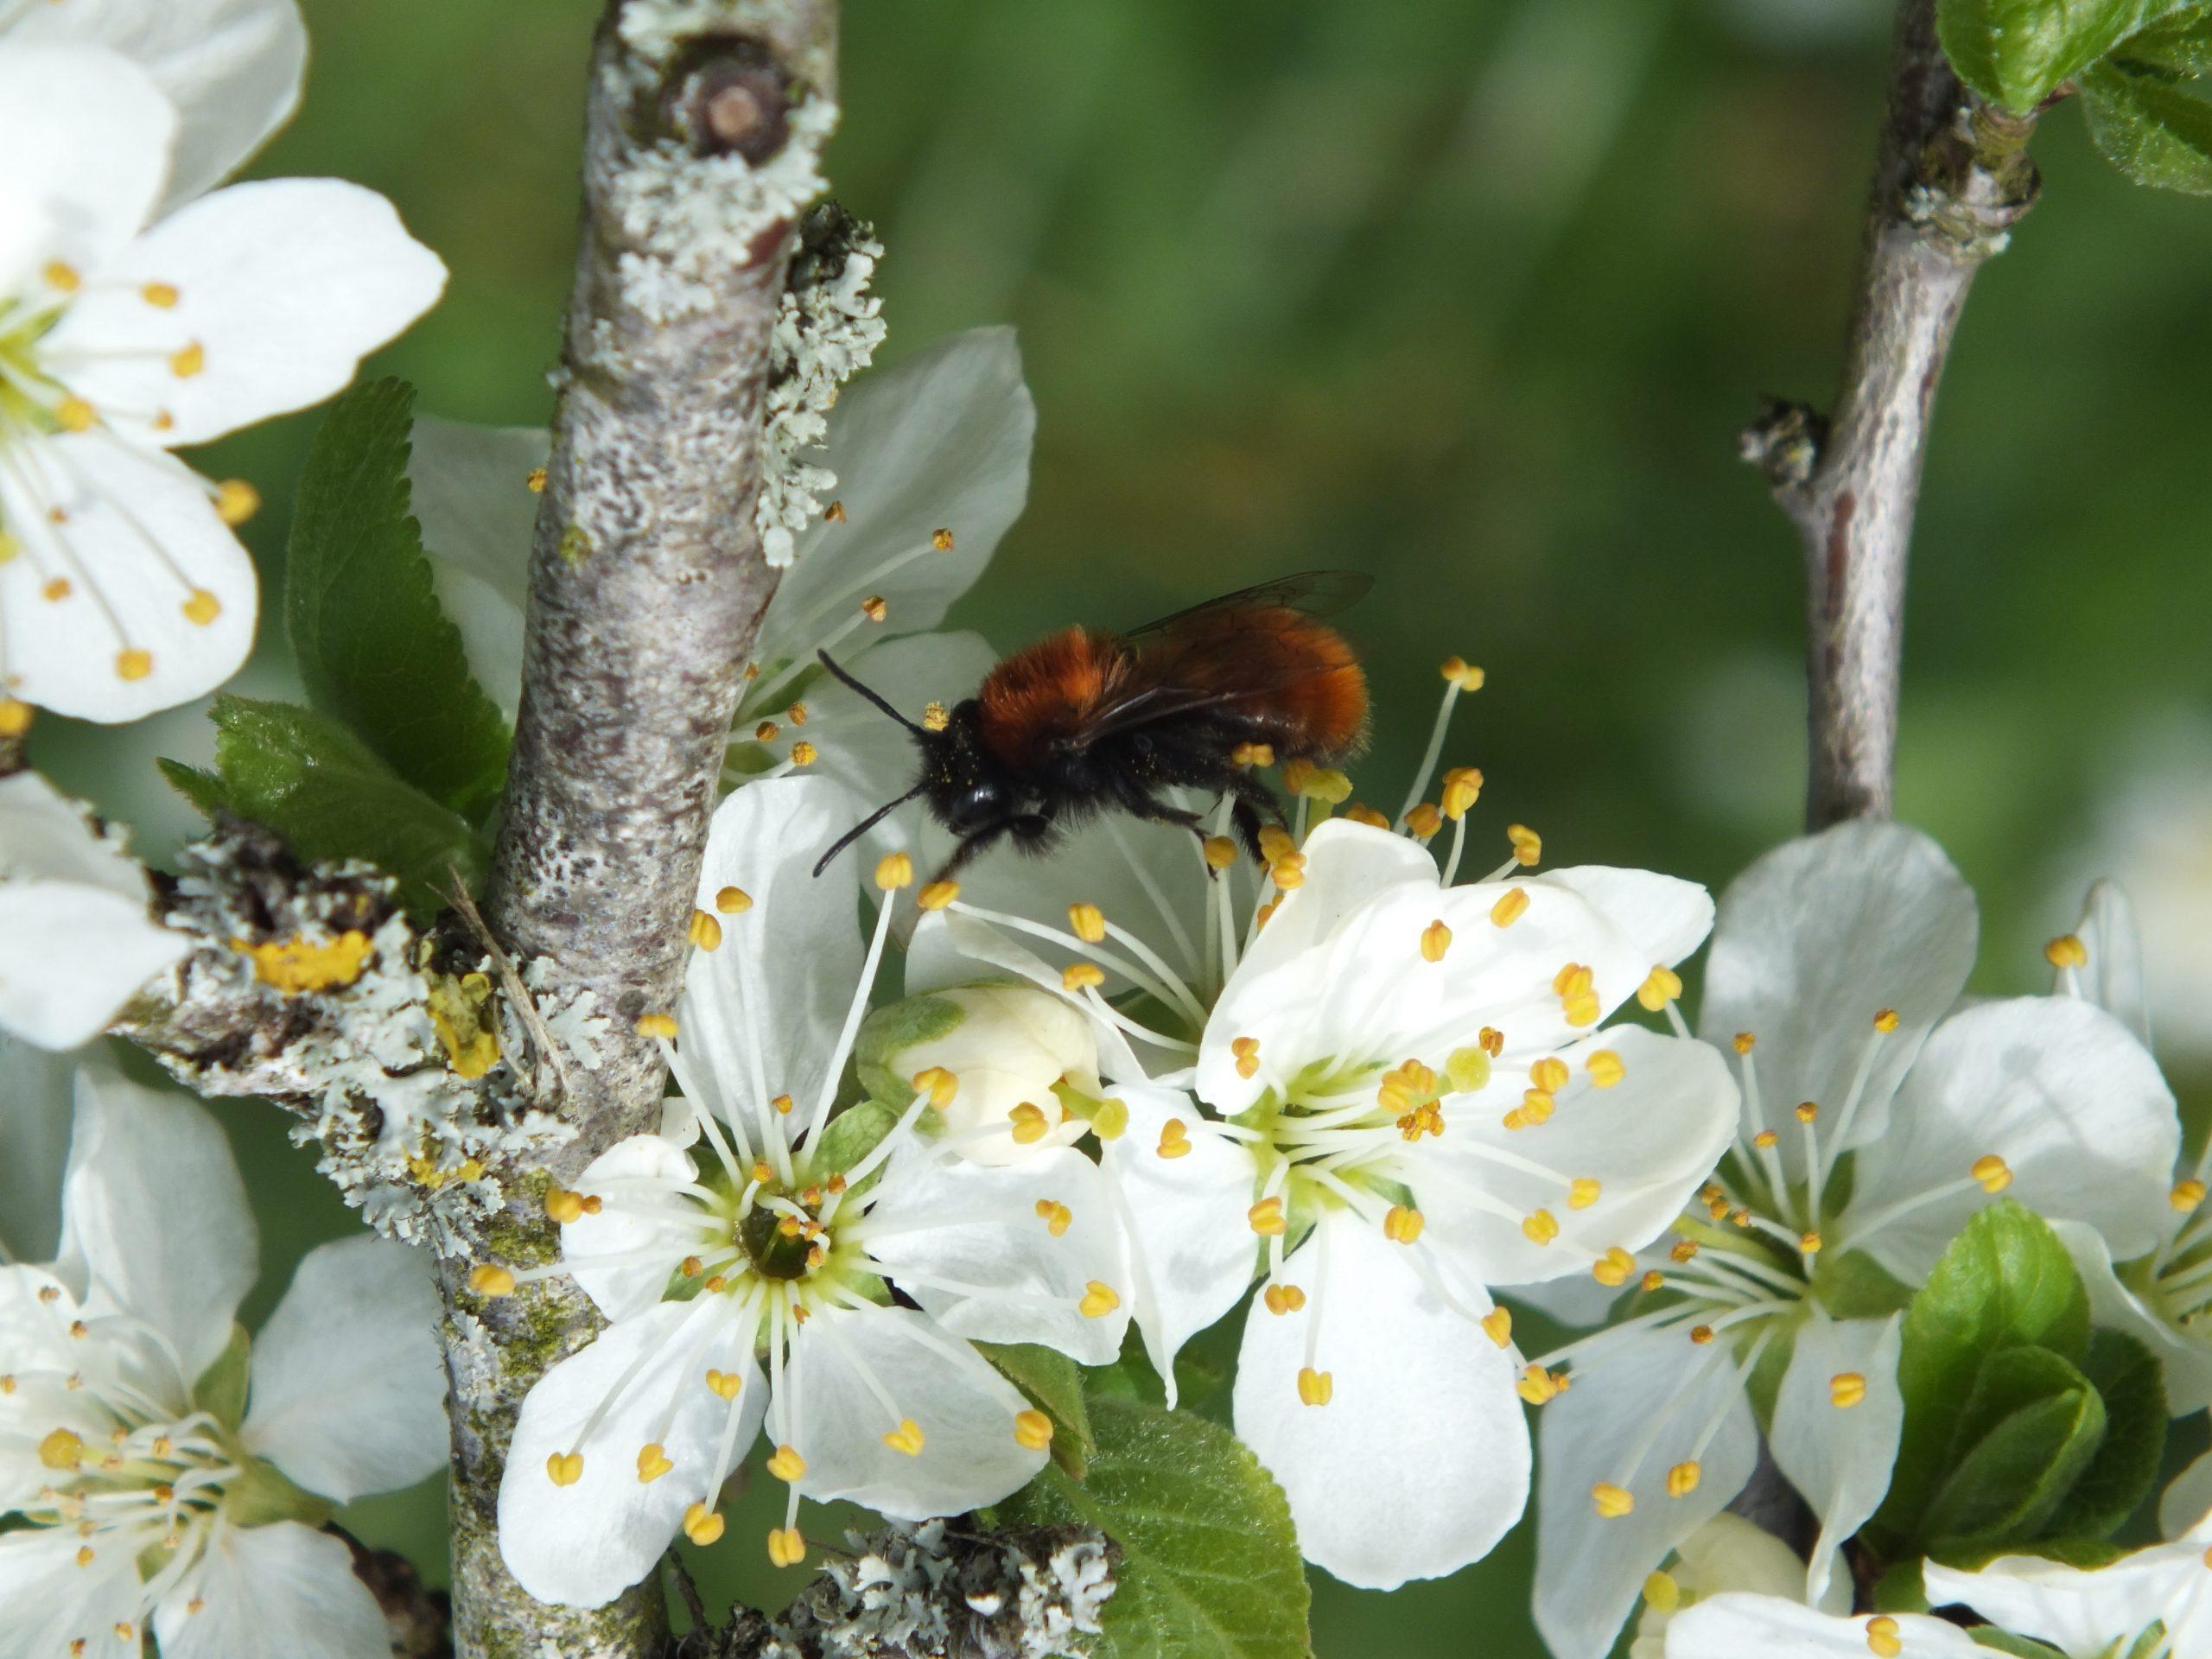 Tawny-Mining-Bee-Andrena-fulva-31.3.21.The-Bassetts-Stroud.Female